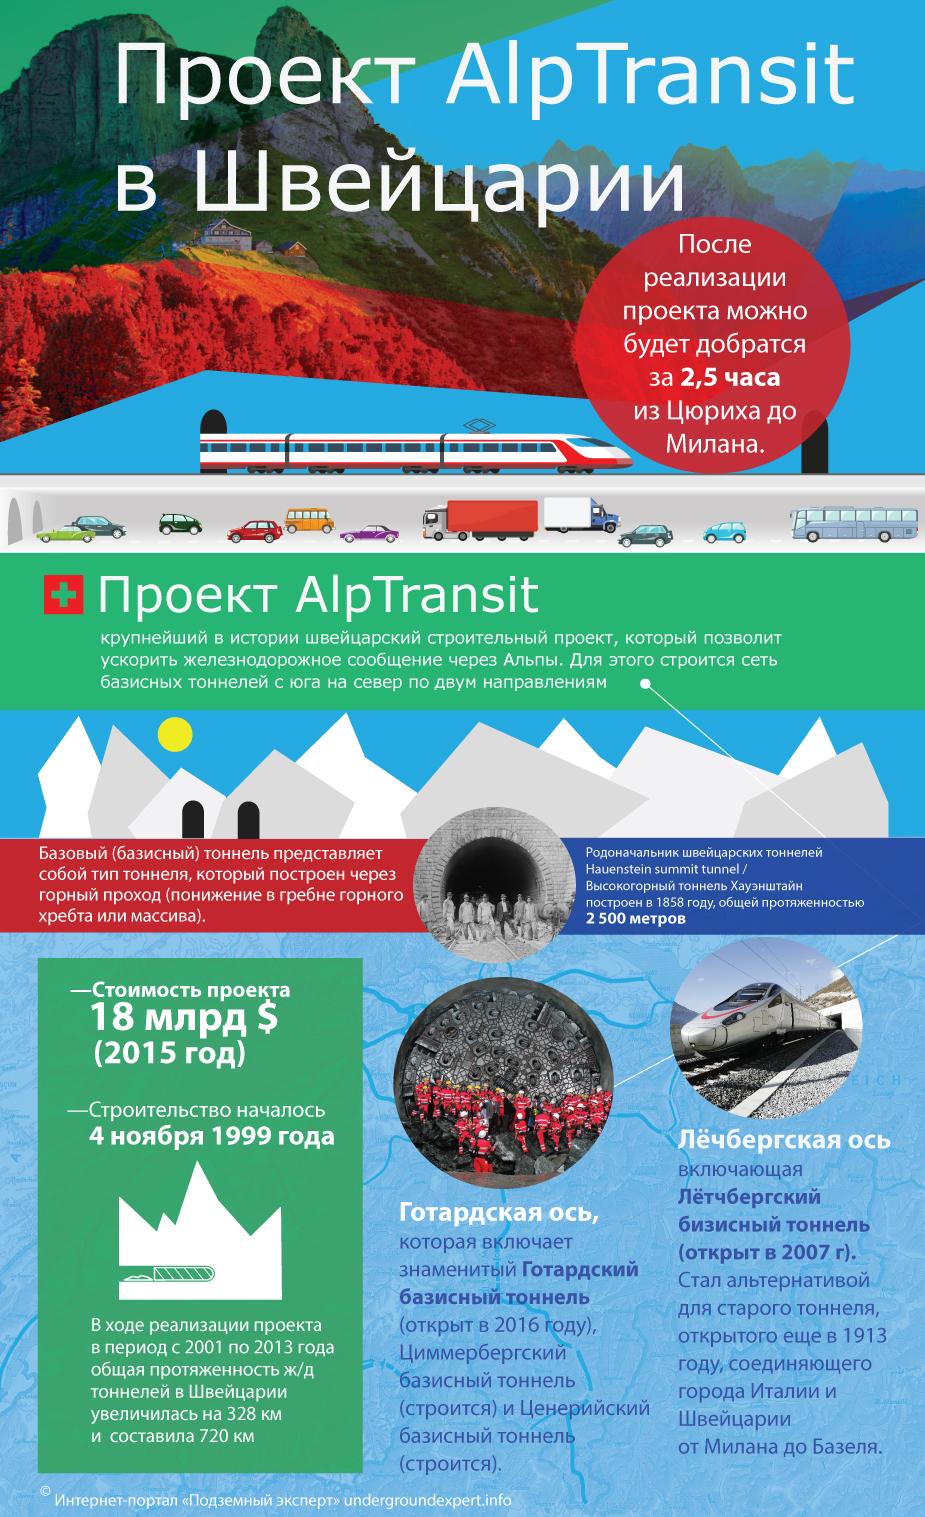 Тоннели Швейцарии